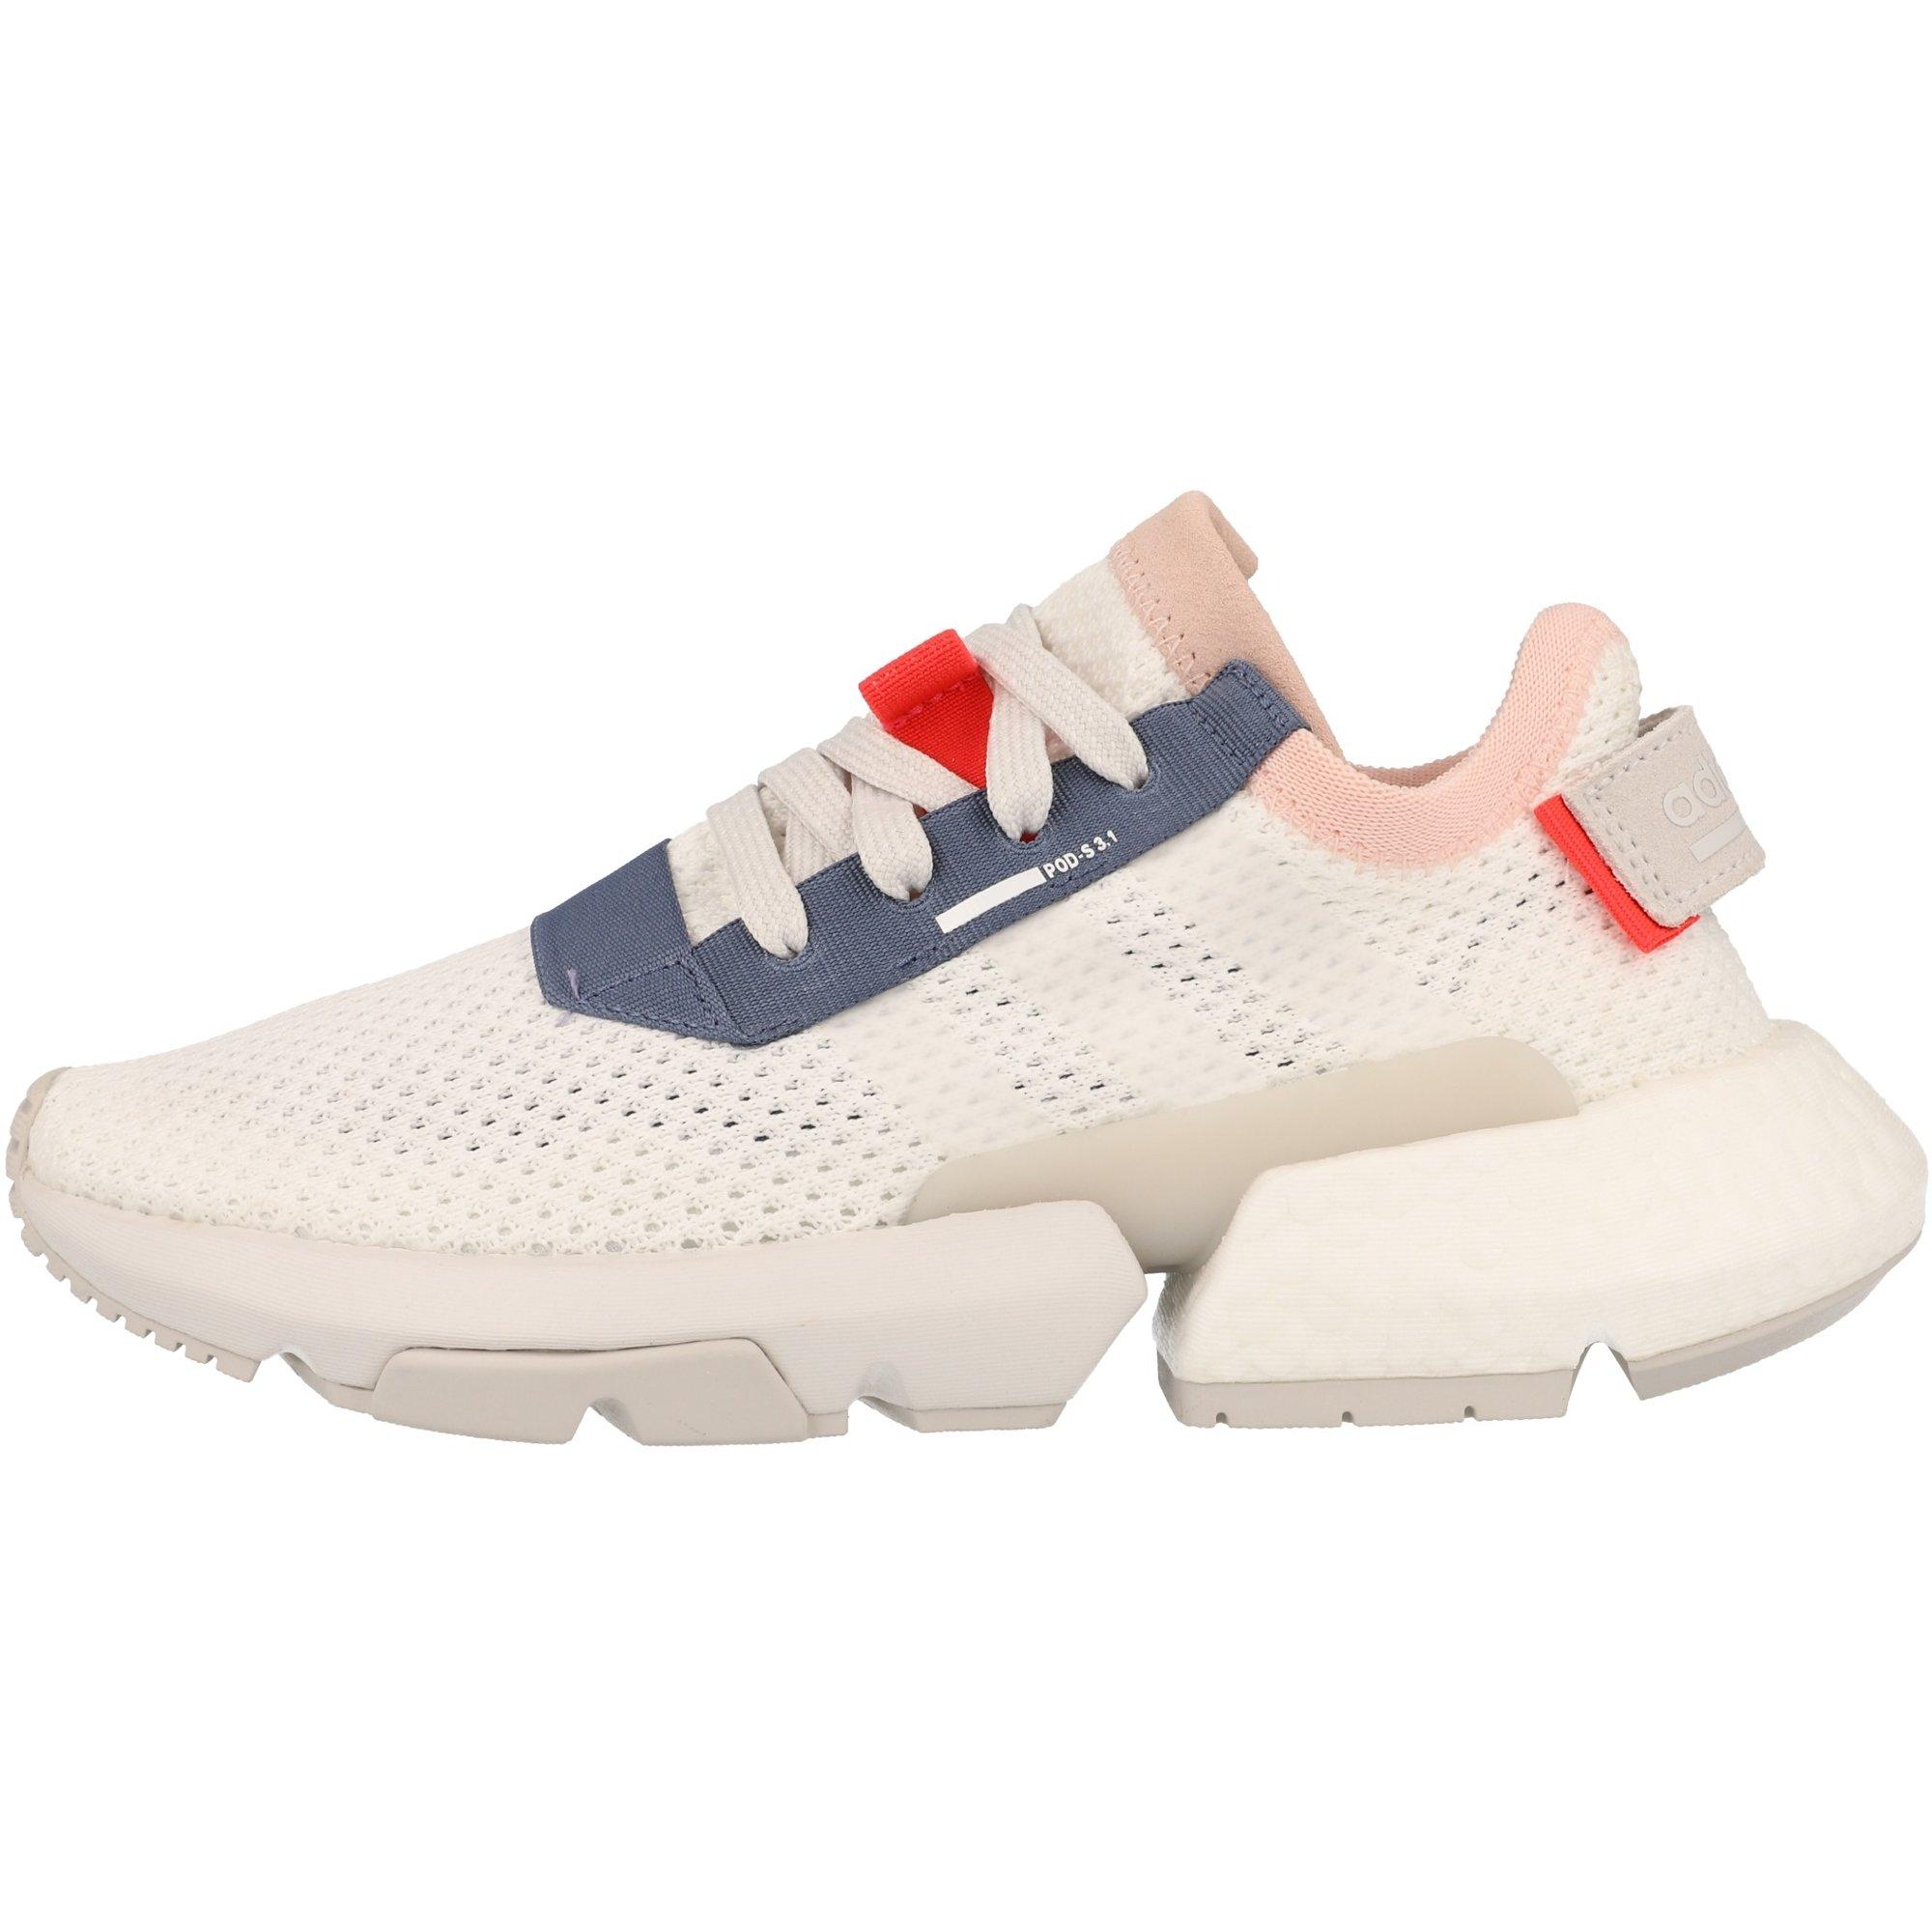 adidas Originals POD S3.1 J BlancGris Un Textile Junior